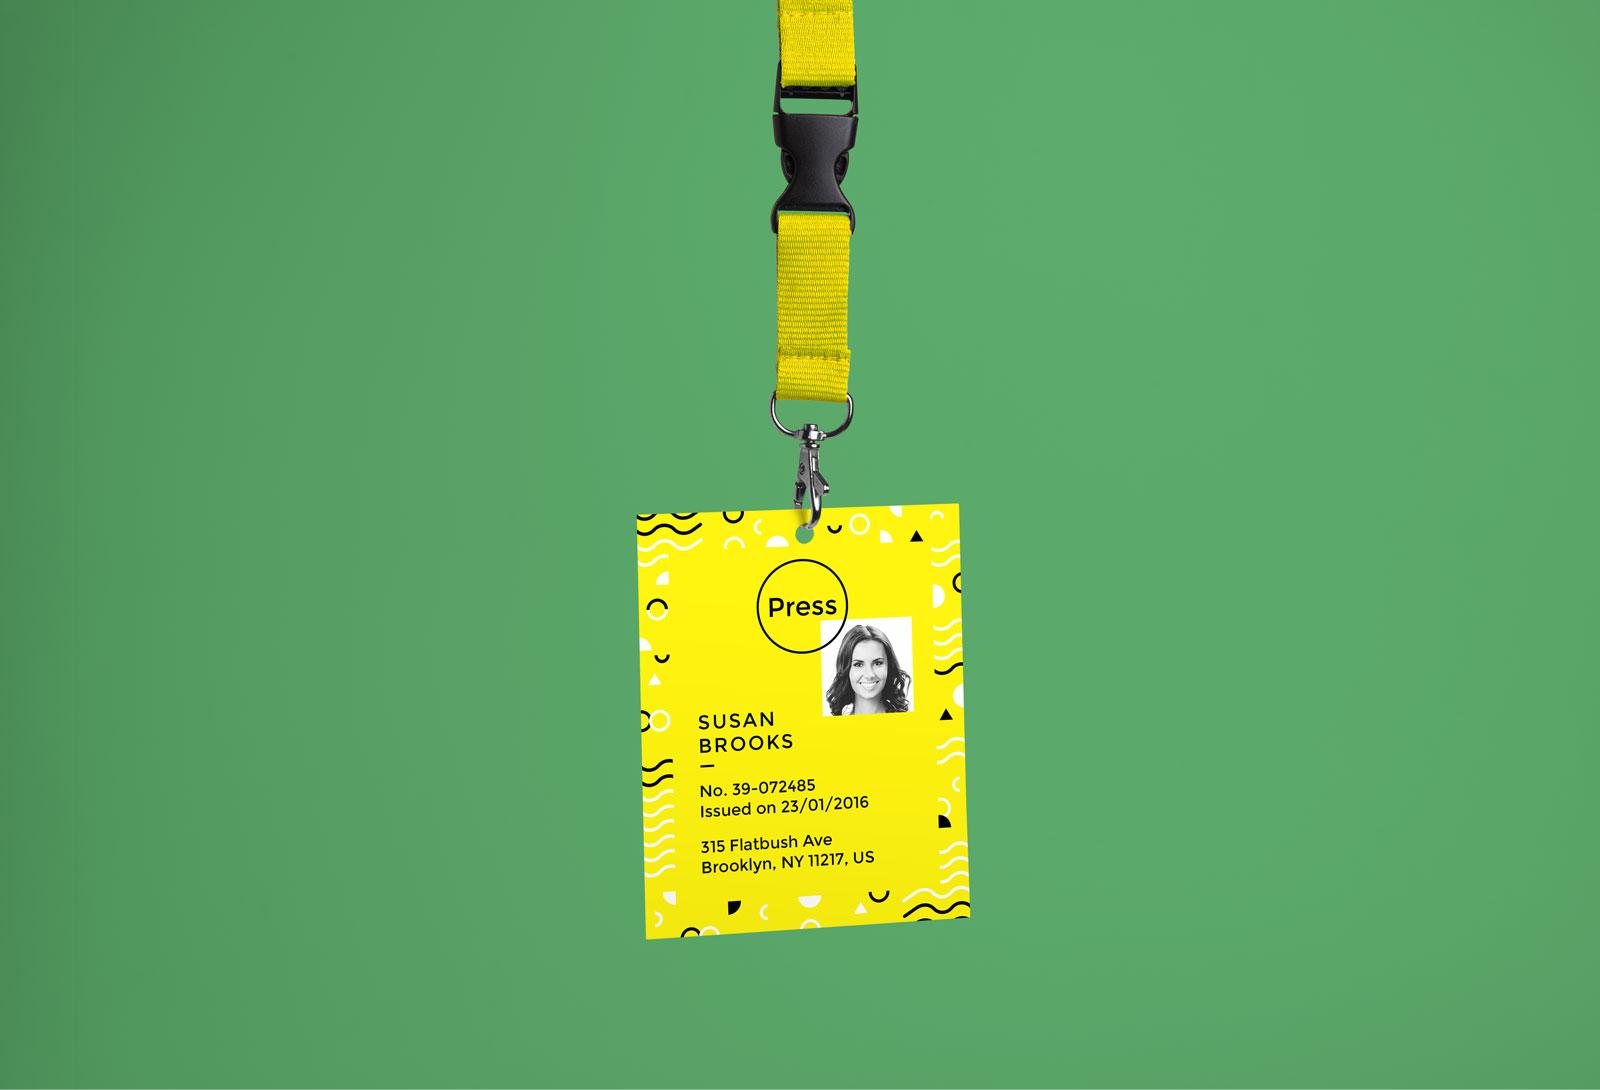 Free-Company-ID-Card-Mockup-PSD-2